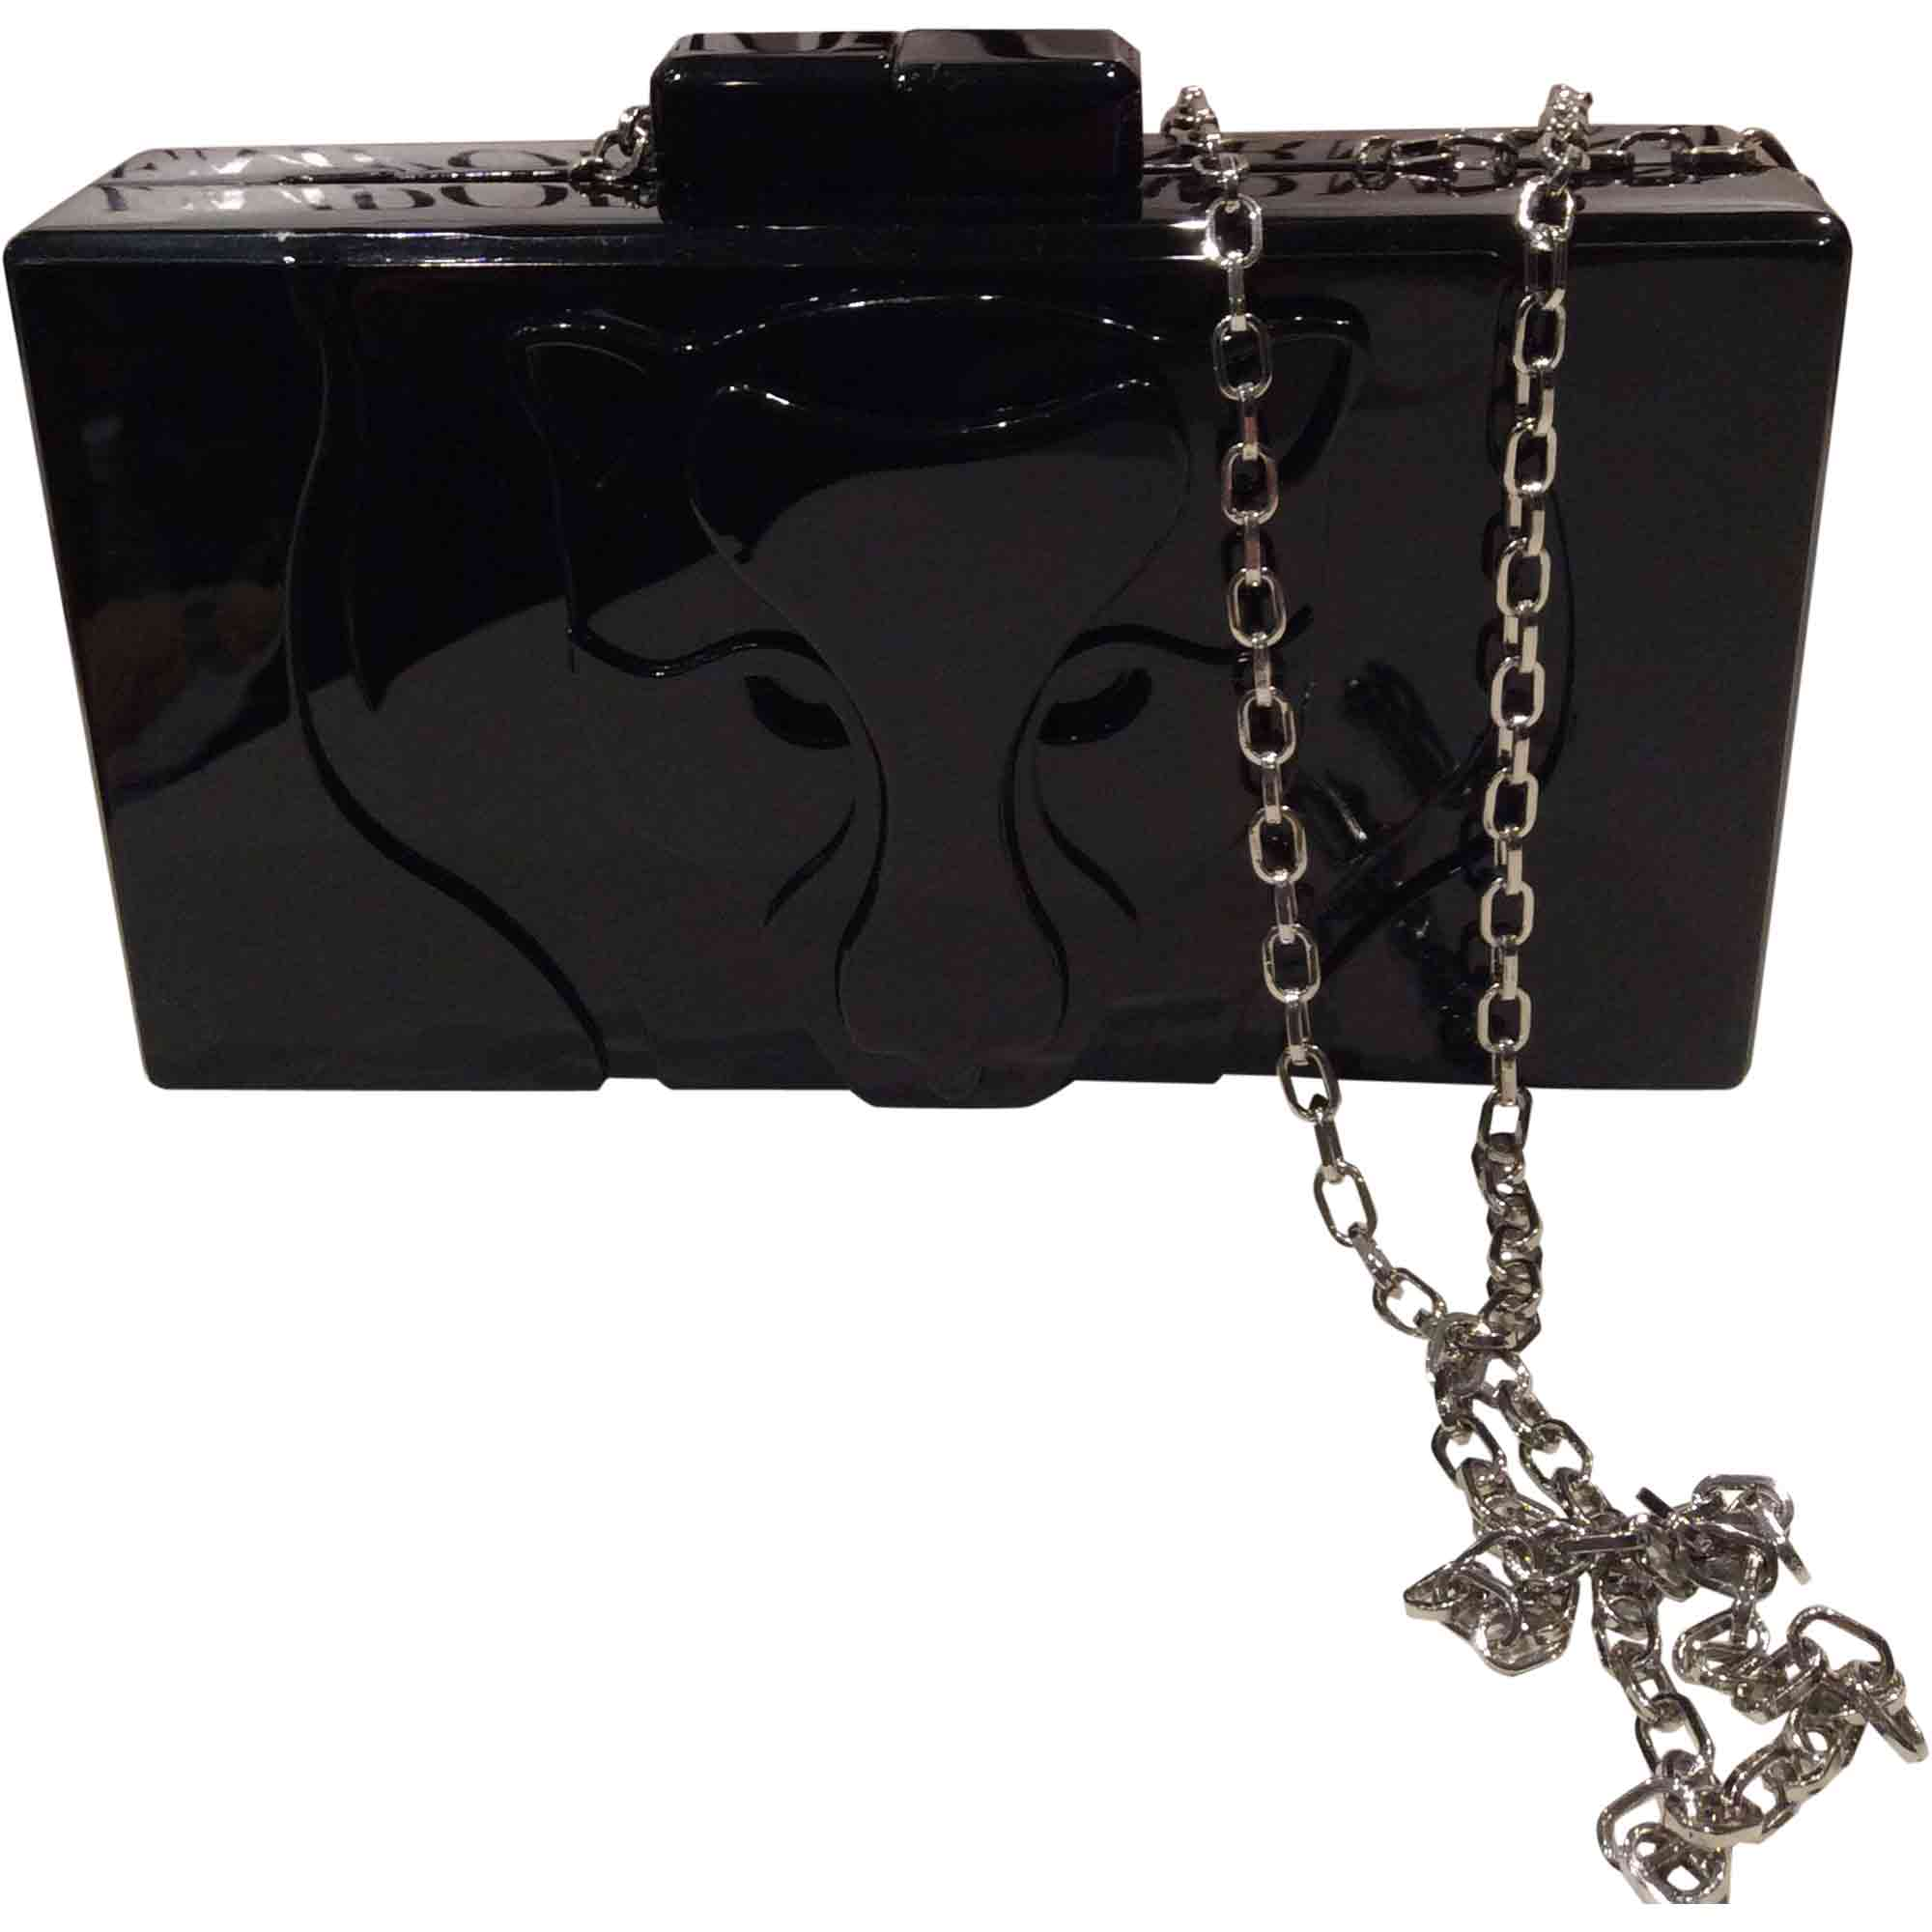 7faad7653b4 Sac en bandoulière en cuir EMPORIO ARMANI noir vendu par Plumie ...